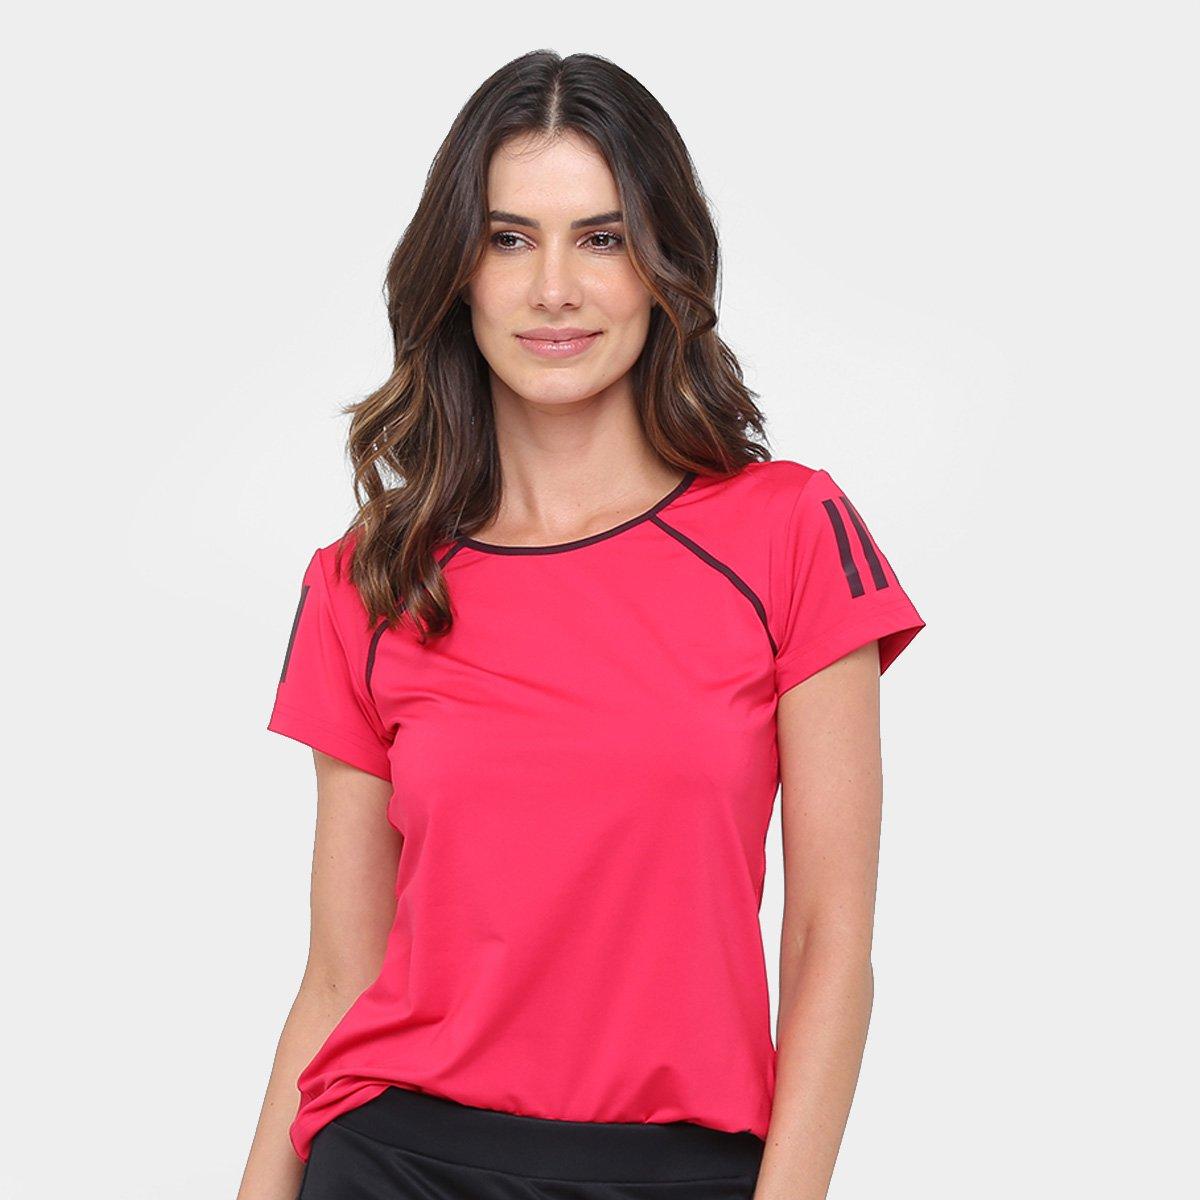 9b6deadc9ed7c Camiseta Adidas Club Feminina | São Paulo Mania